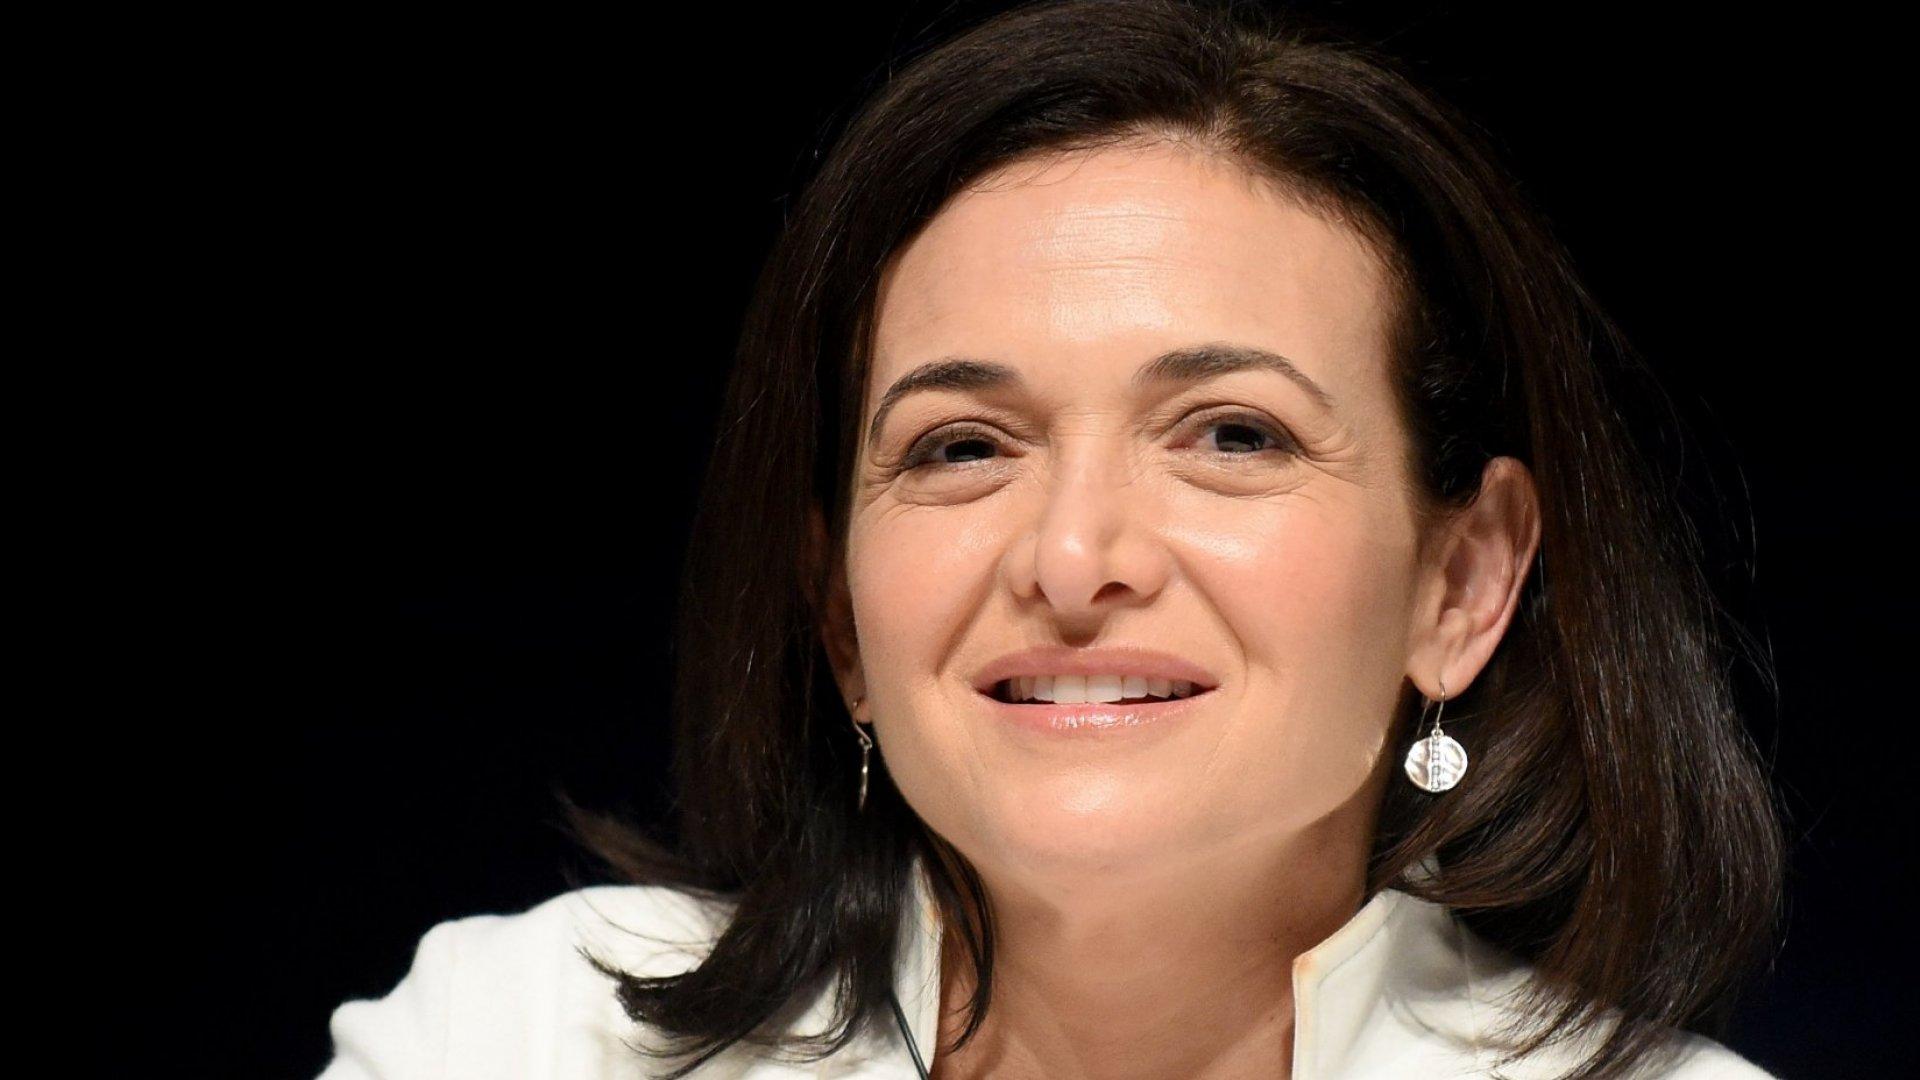 10 Sheryl Sandberg Facts You Haven't Heard